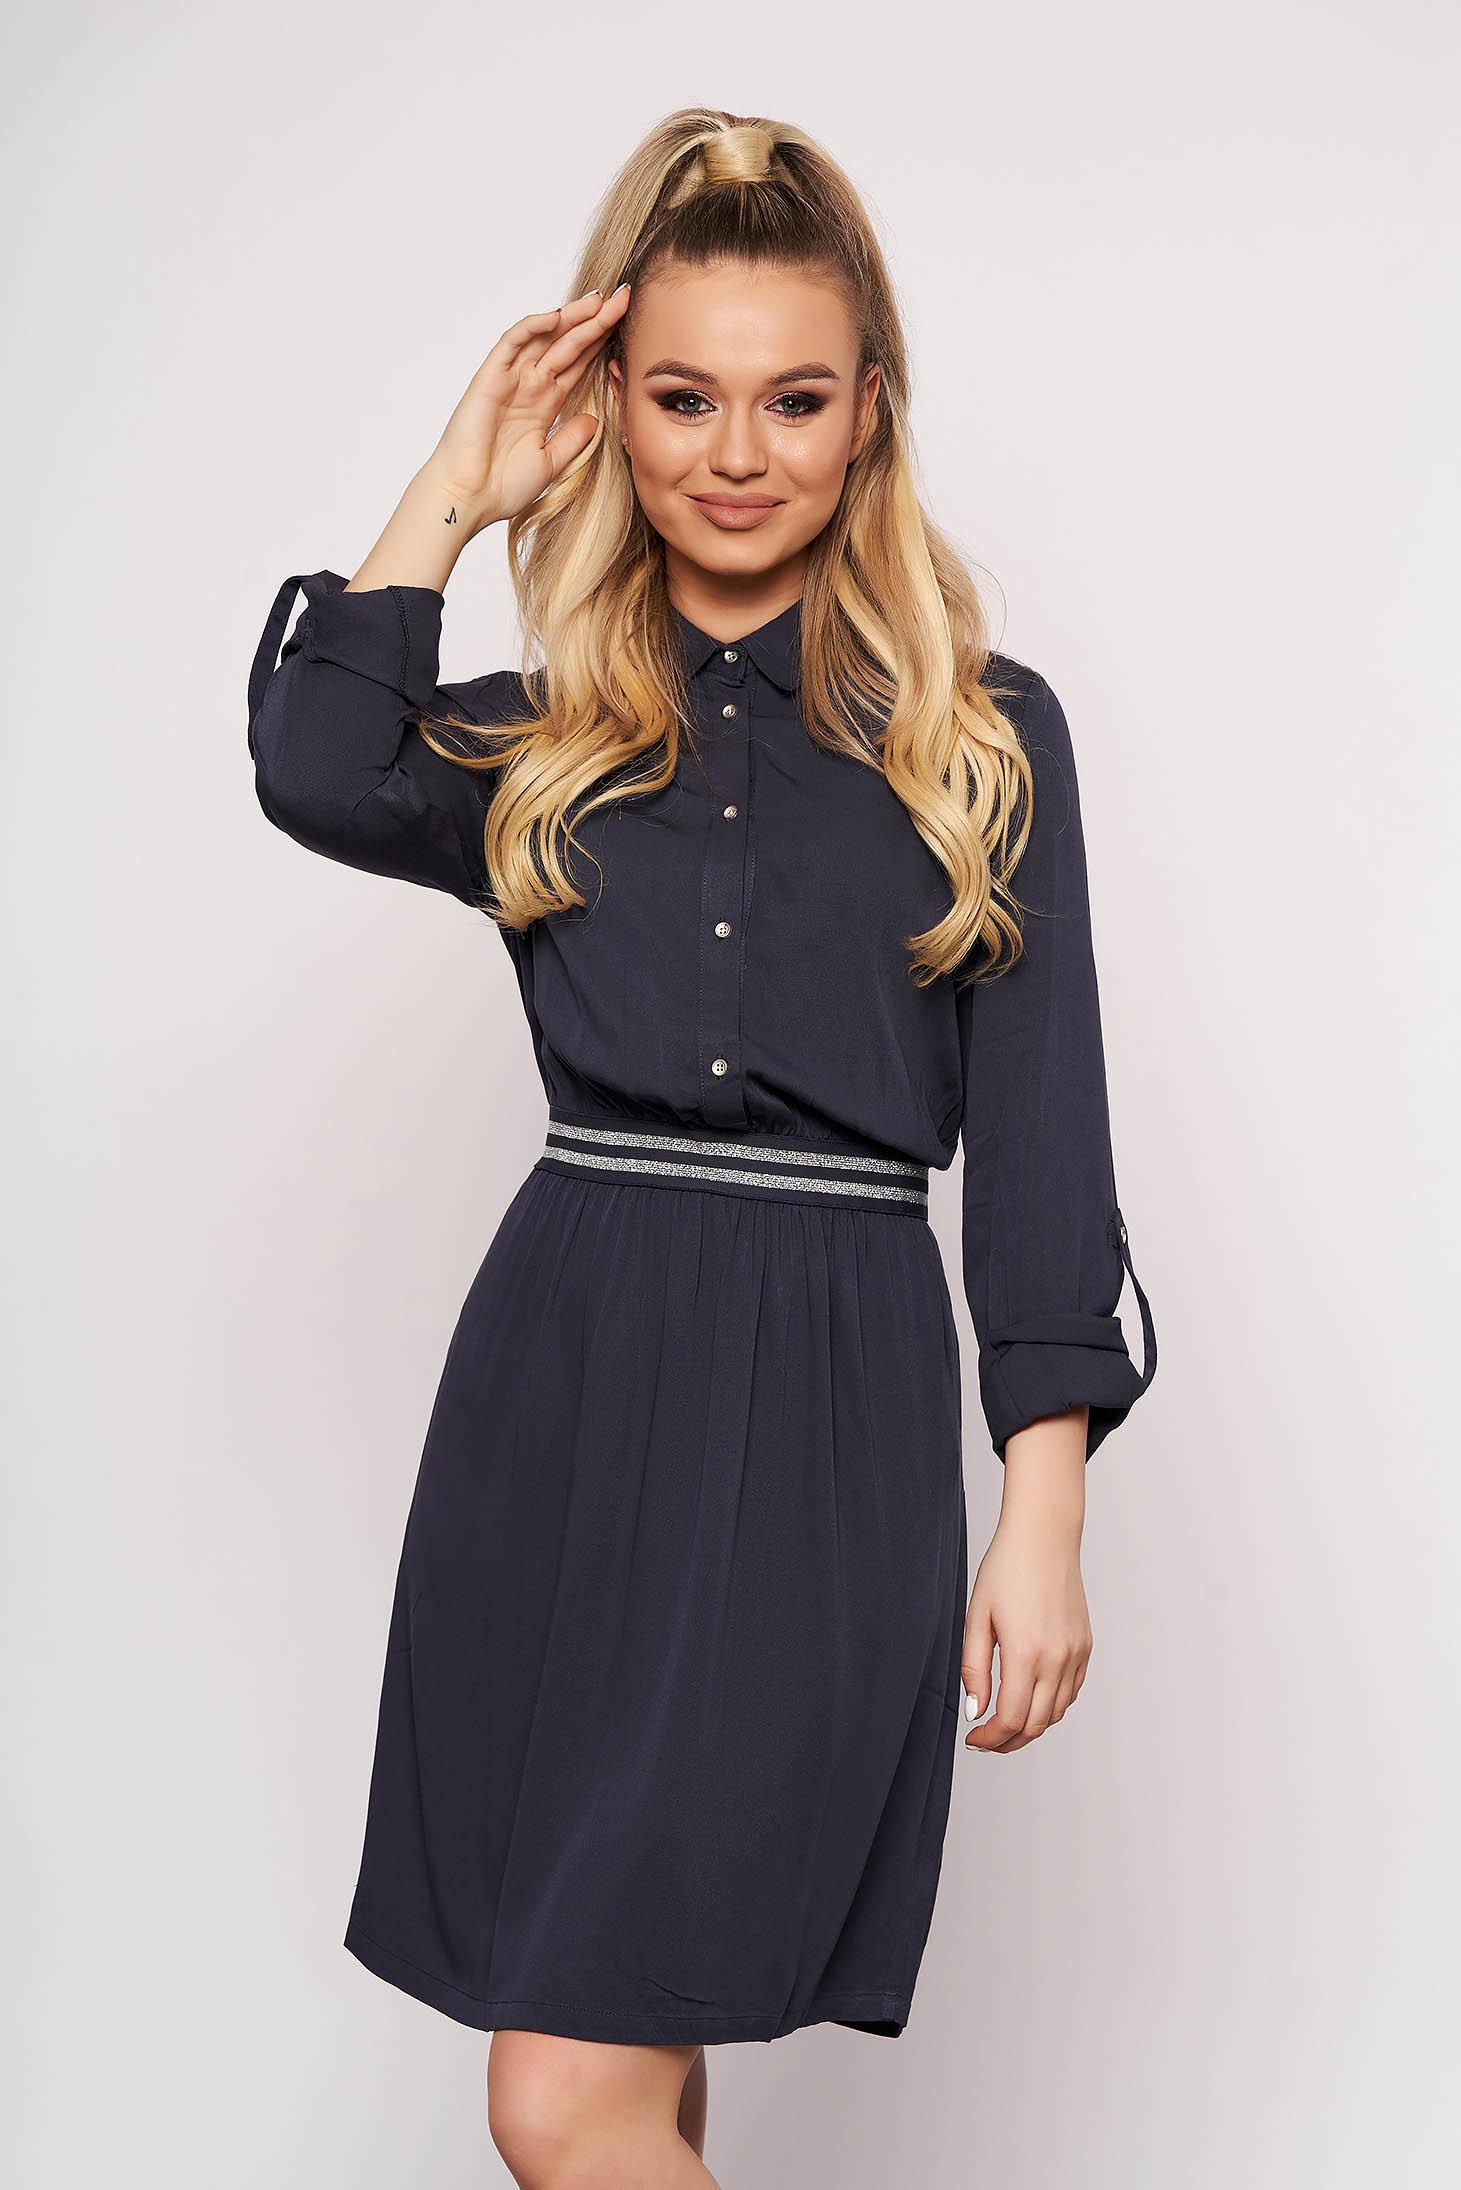 Darkblue dress casual short cut cloche daily cotton thin fabric with elastic waist